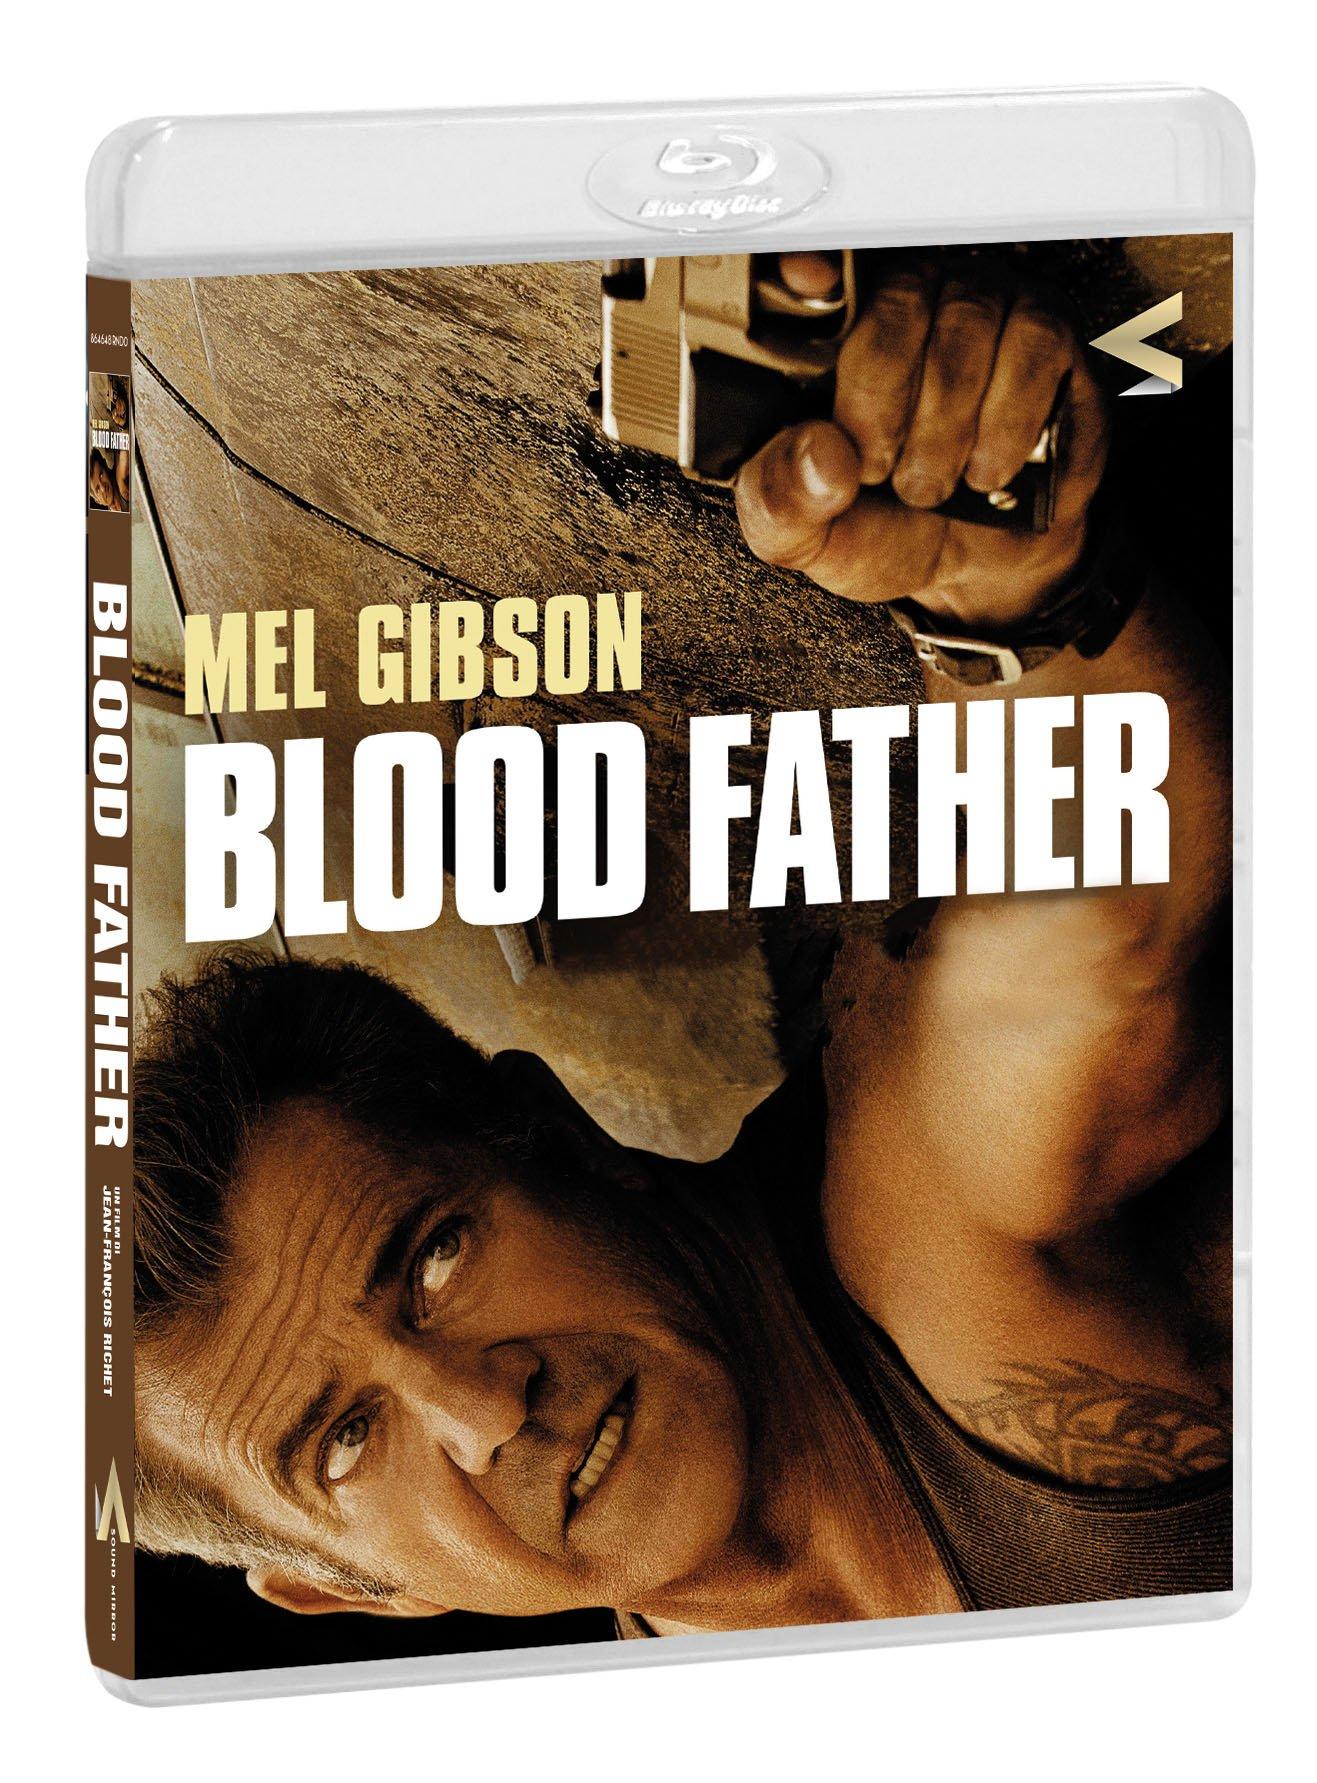 BLOOD FATHER - BLU RAY